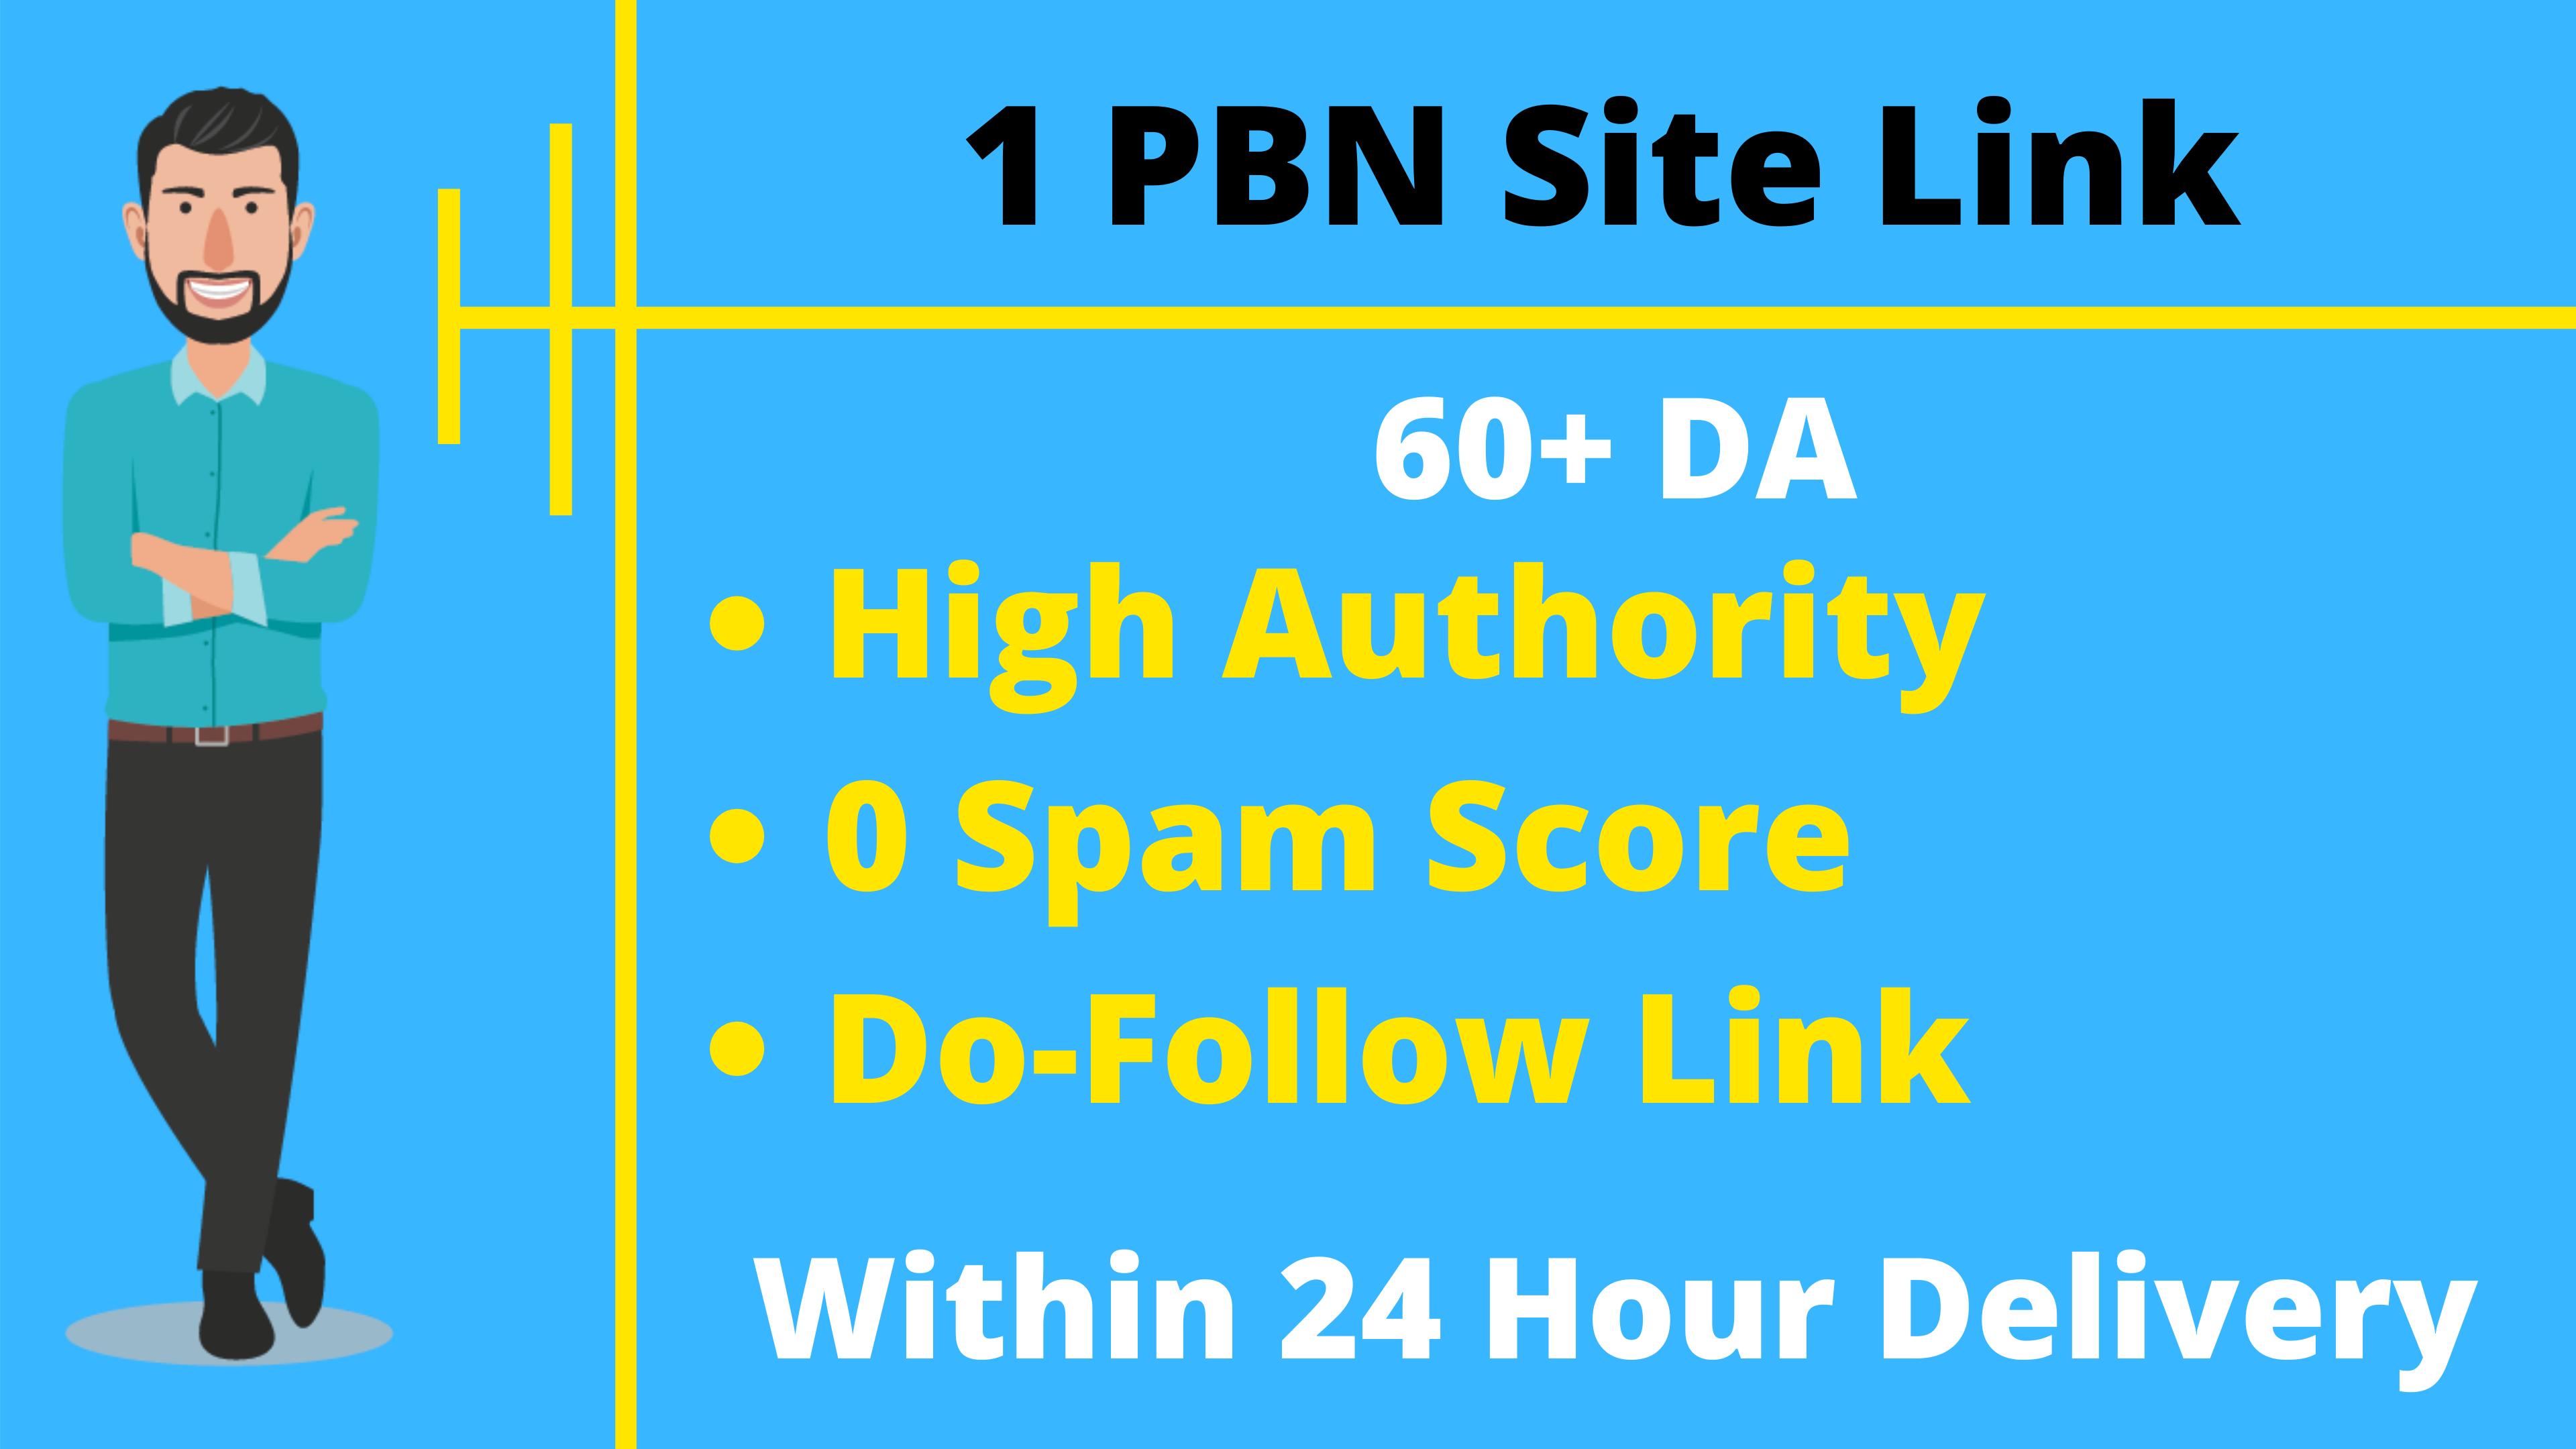 1 PBN Site Dofollow Backlink 60+ DA High Authority SEO Link